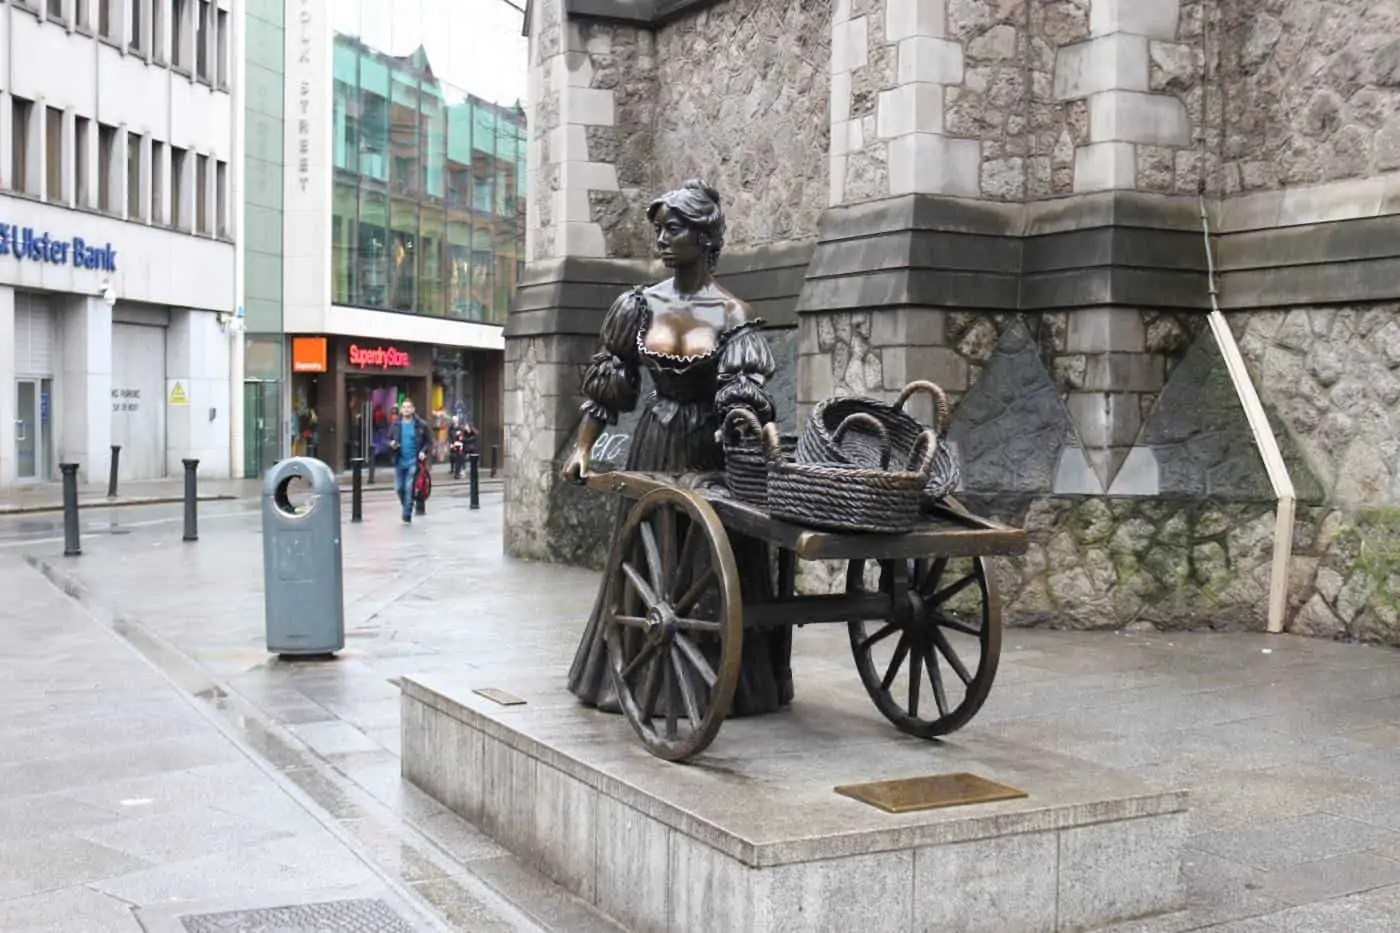 Molly Malone Statue in Dublin, Ireland | c/o Deposit Photos